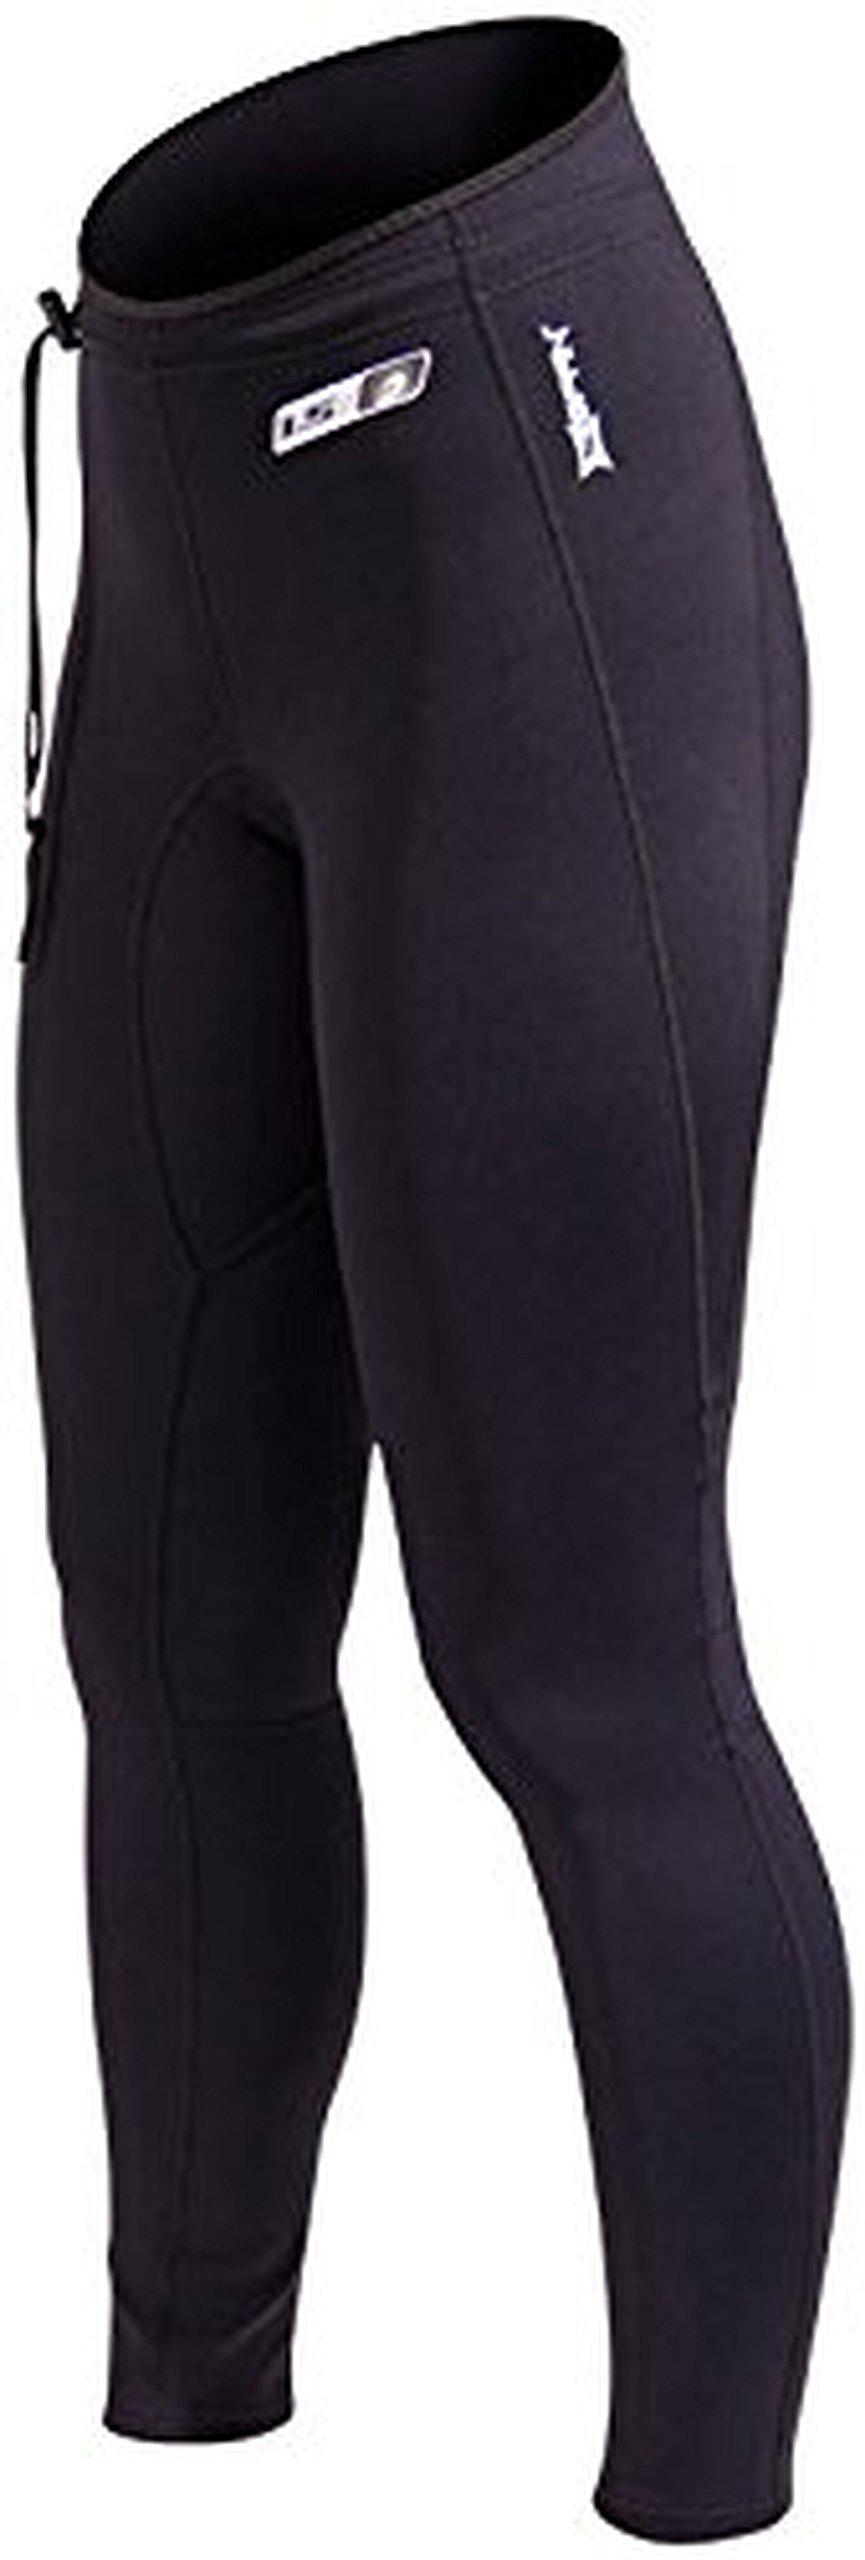 Neosport Unisex XSPAN 1.5mm Pants Black M and Travel Sunscreen (15 SPF) Spray Bundle